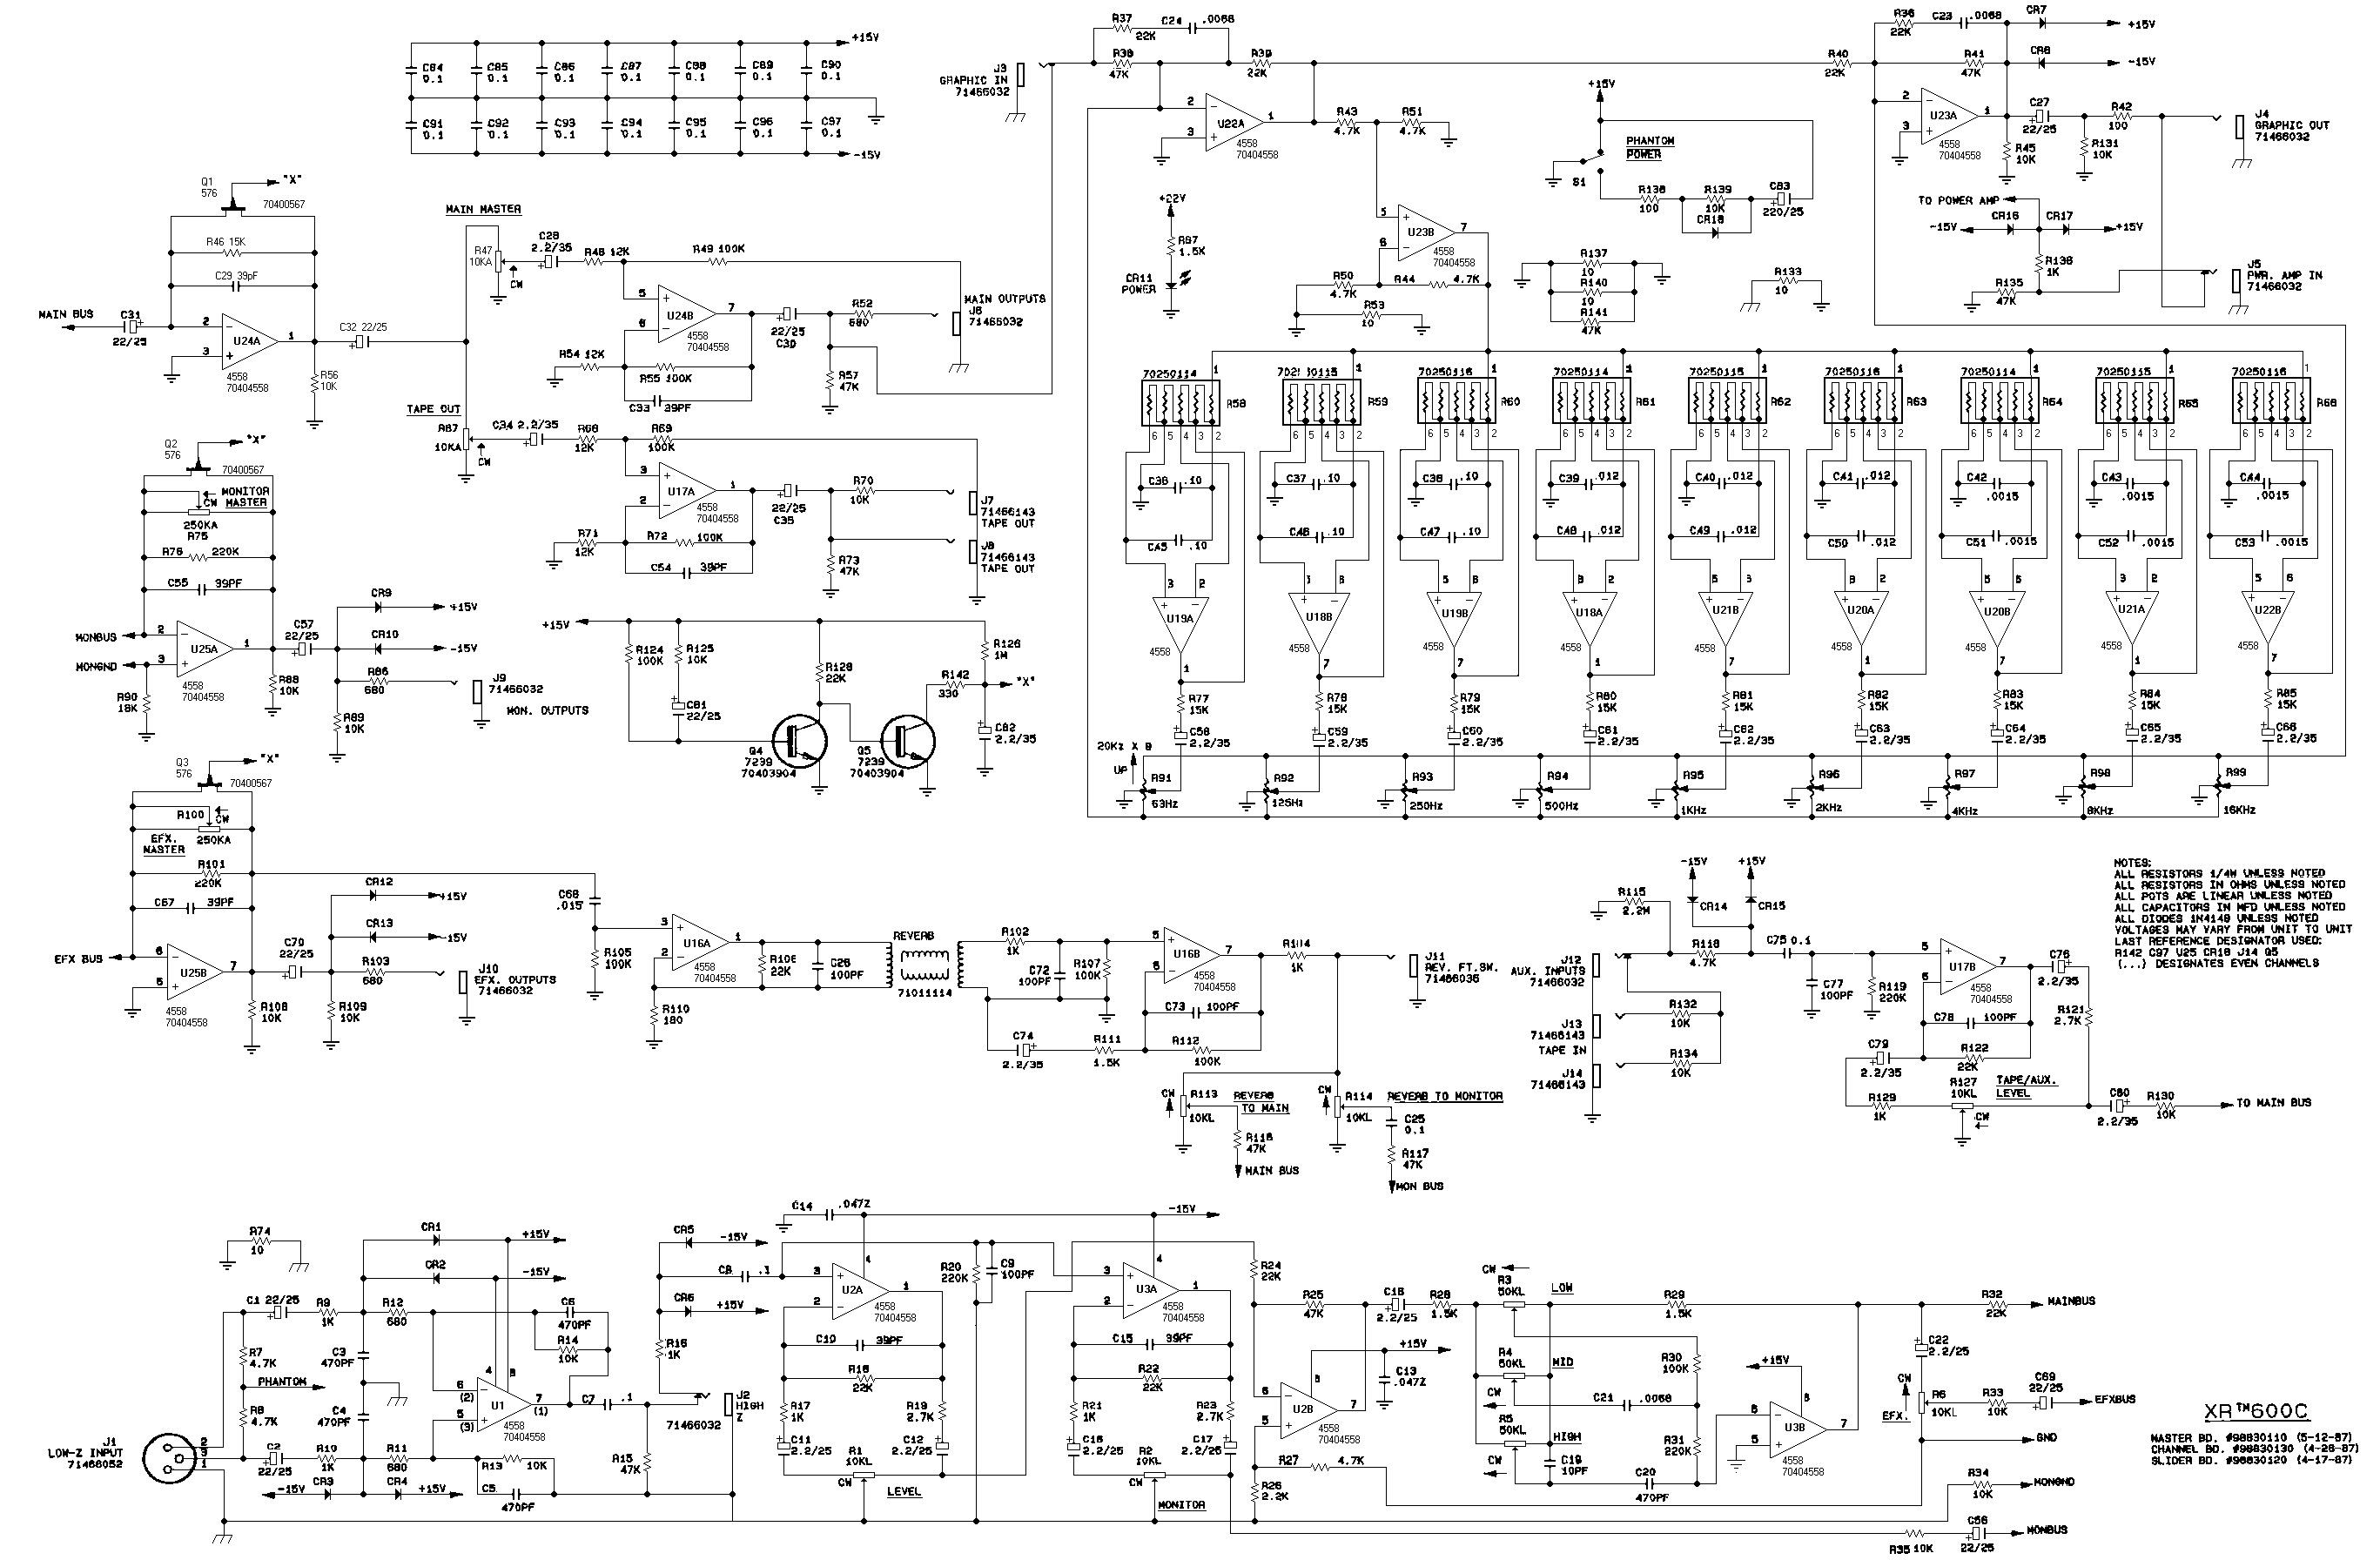 peavey_xr-600c[1].pdf